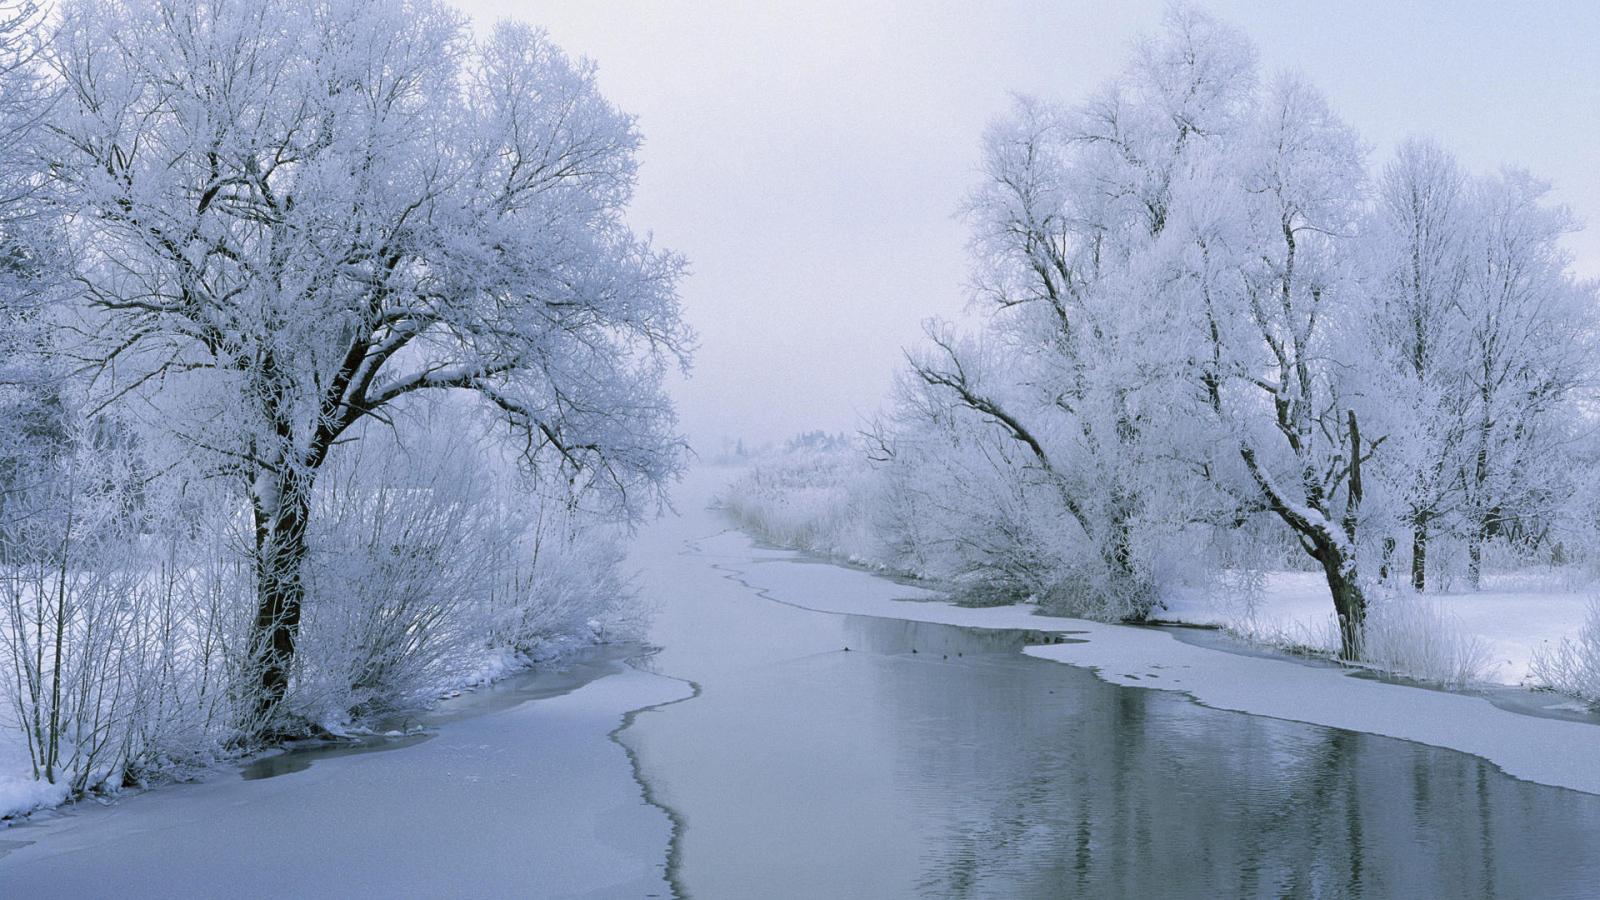 1600x900 hd desktop wallpaper winter - photo #30